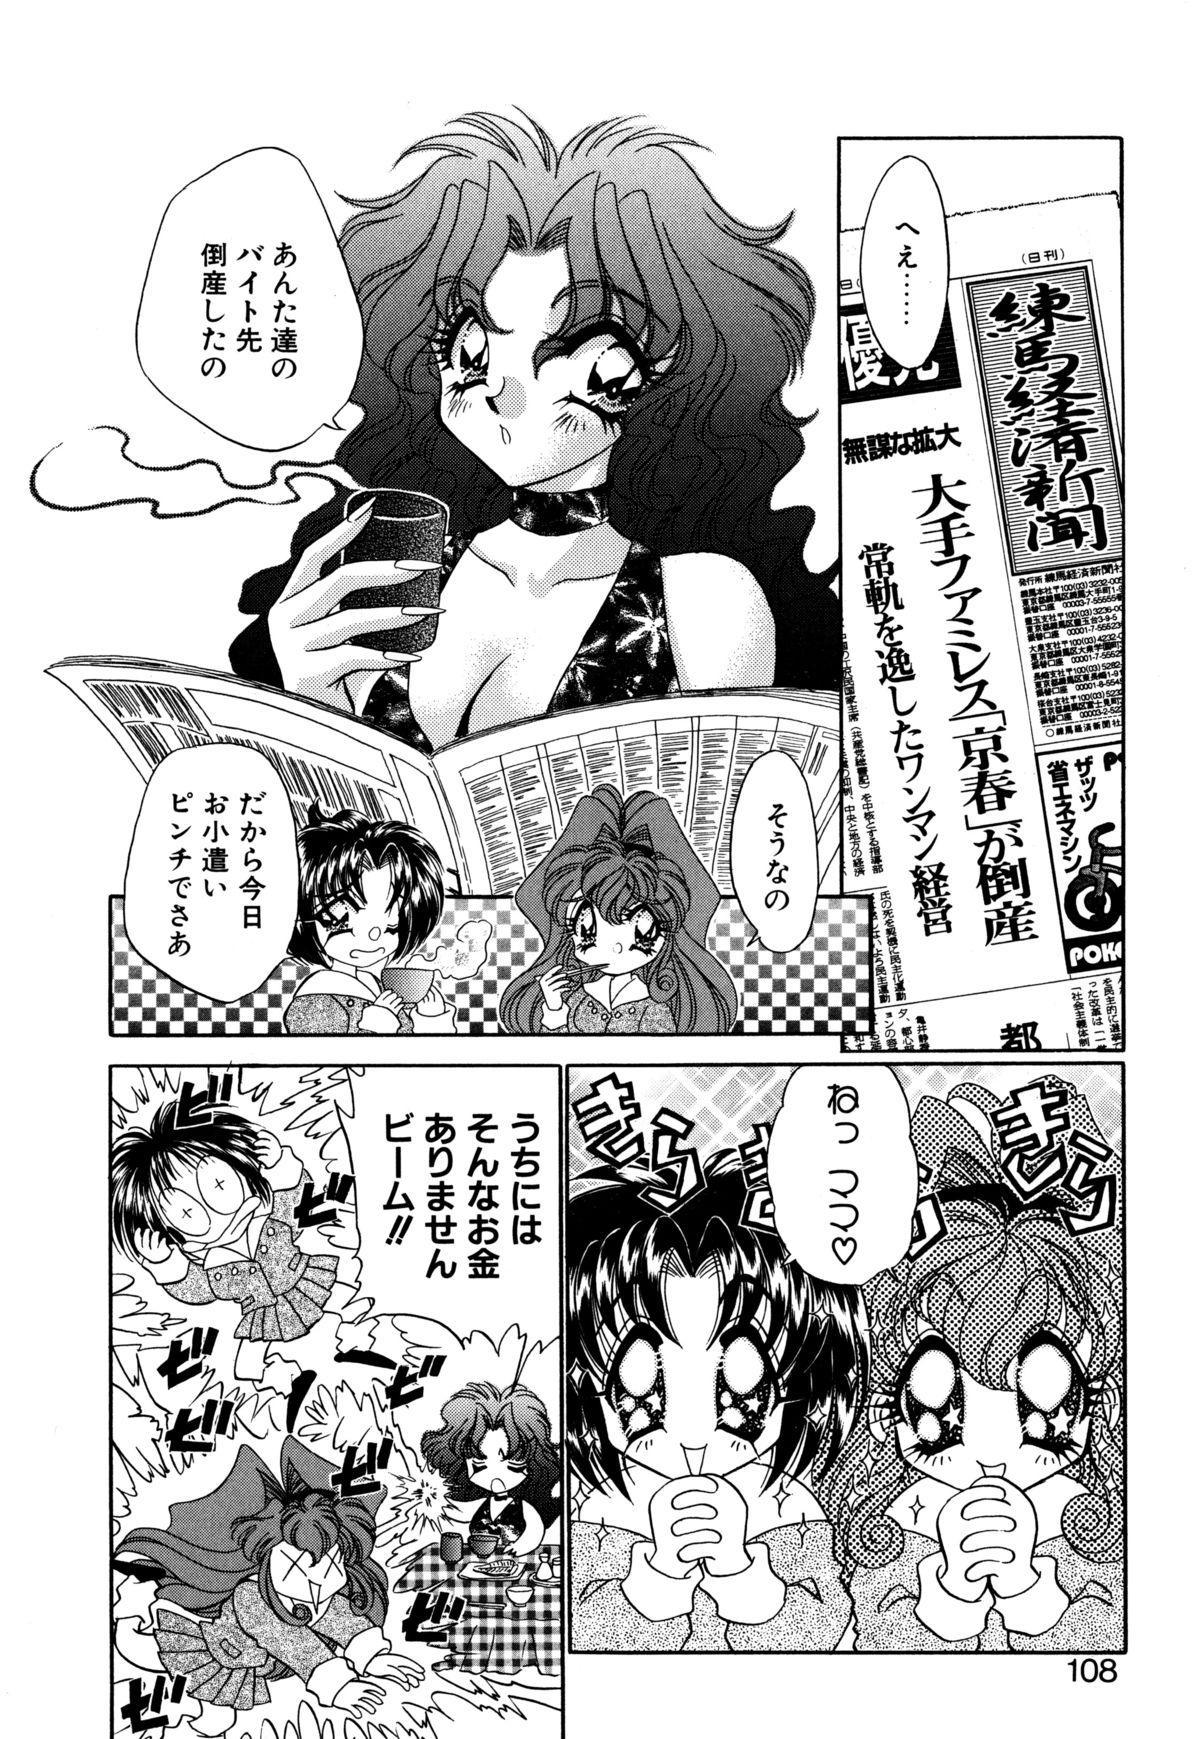 Kigurumi Sentai Quiltian 106